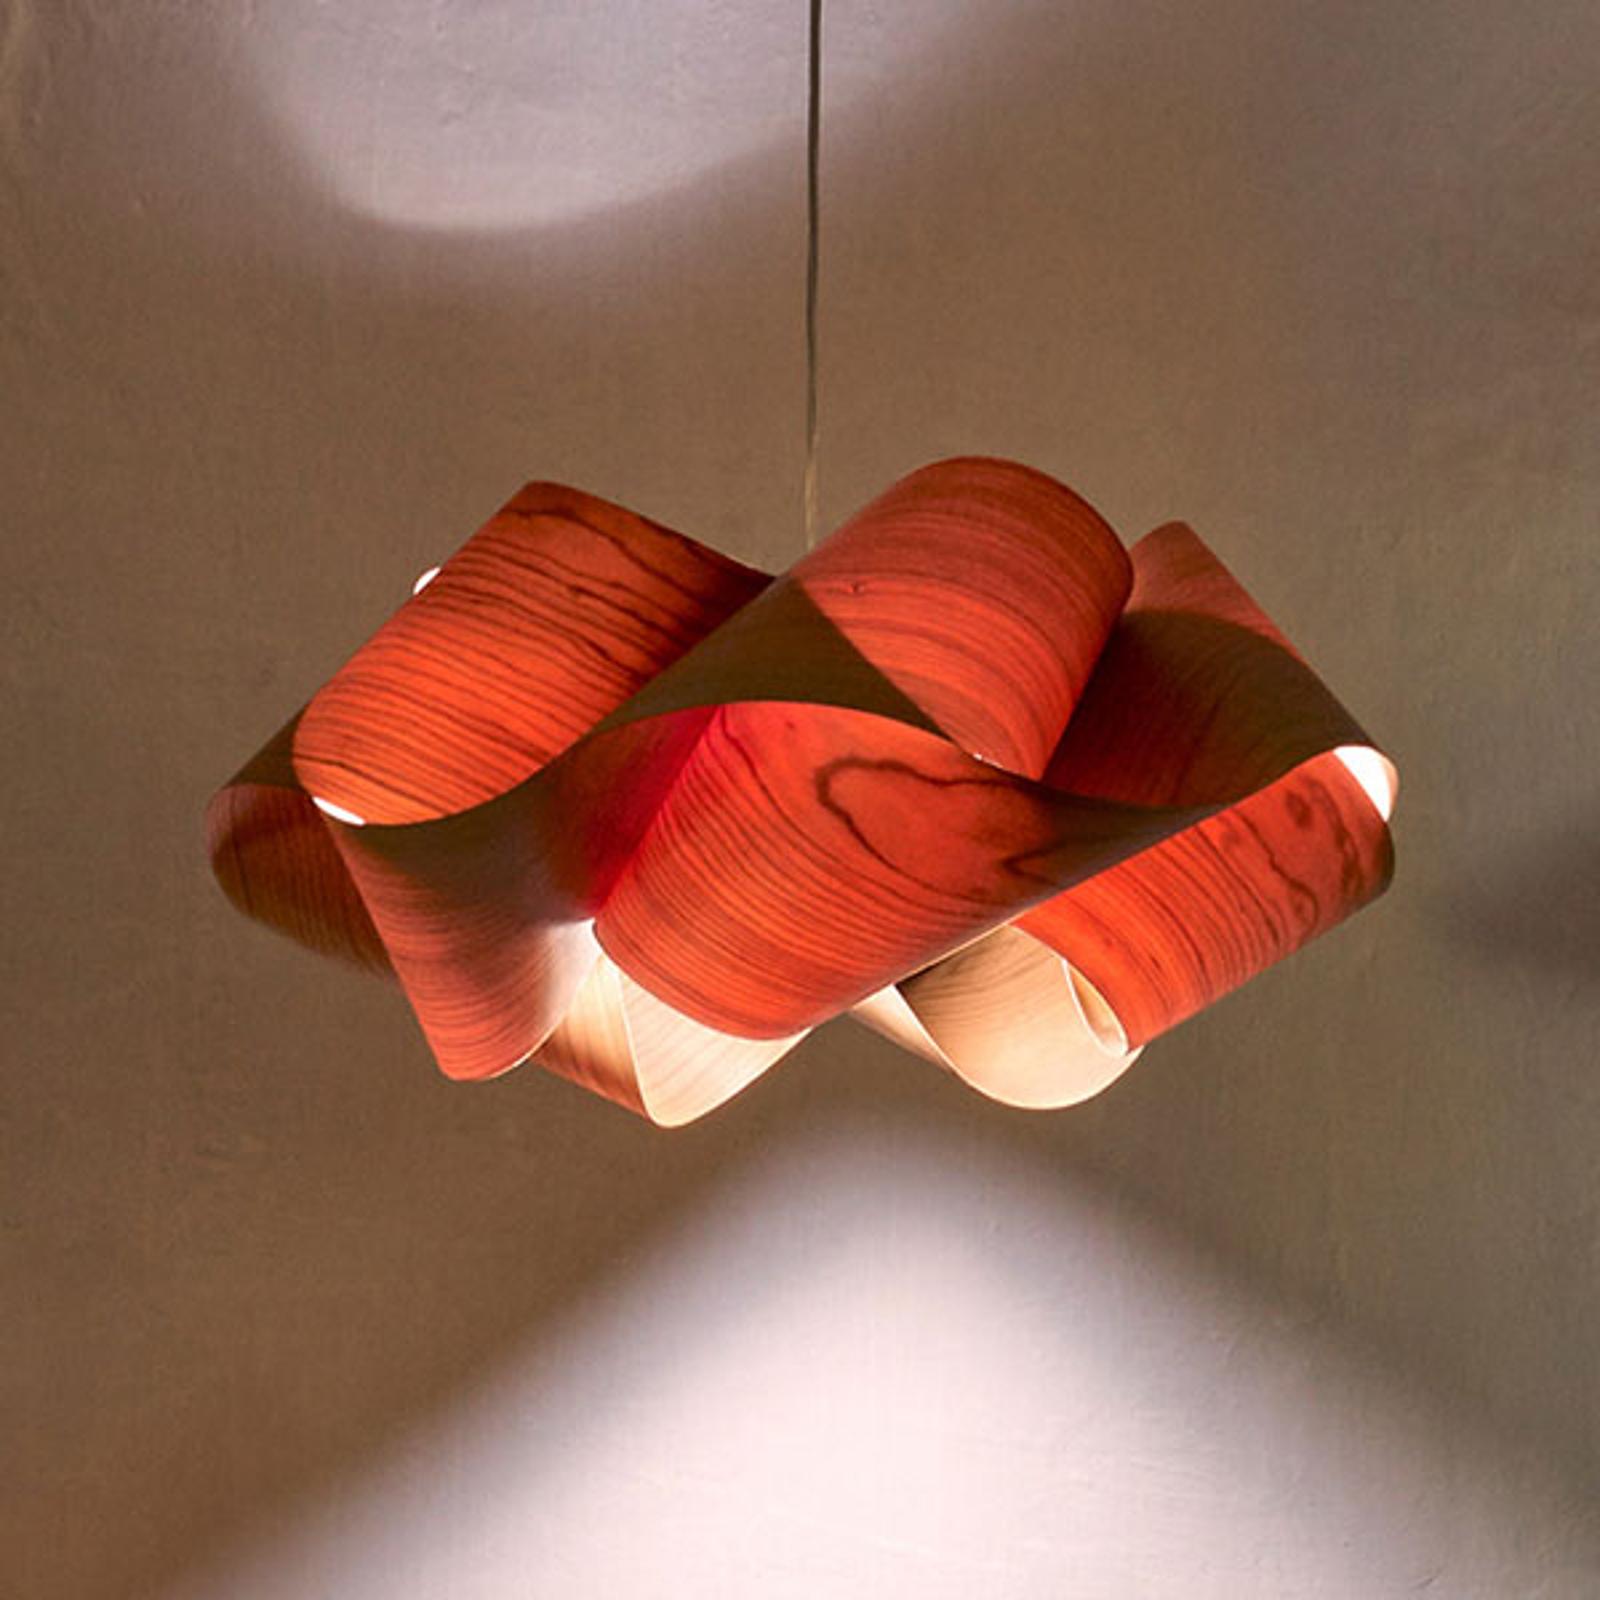 LZF Swirl hængelampe, Ø 54 cm, kirsebærtræ natur